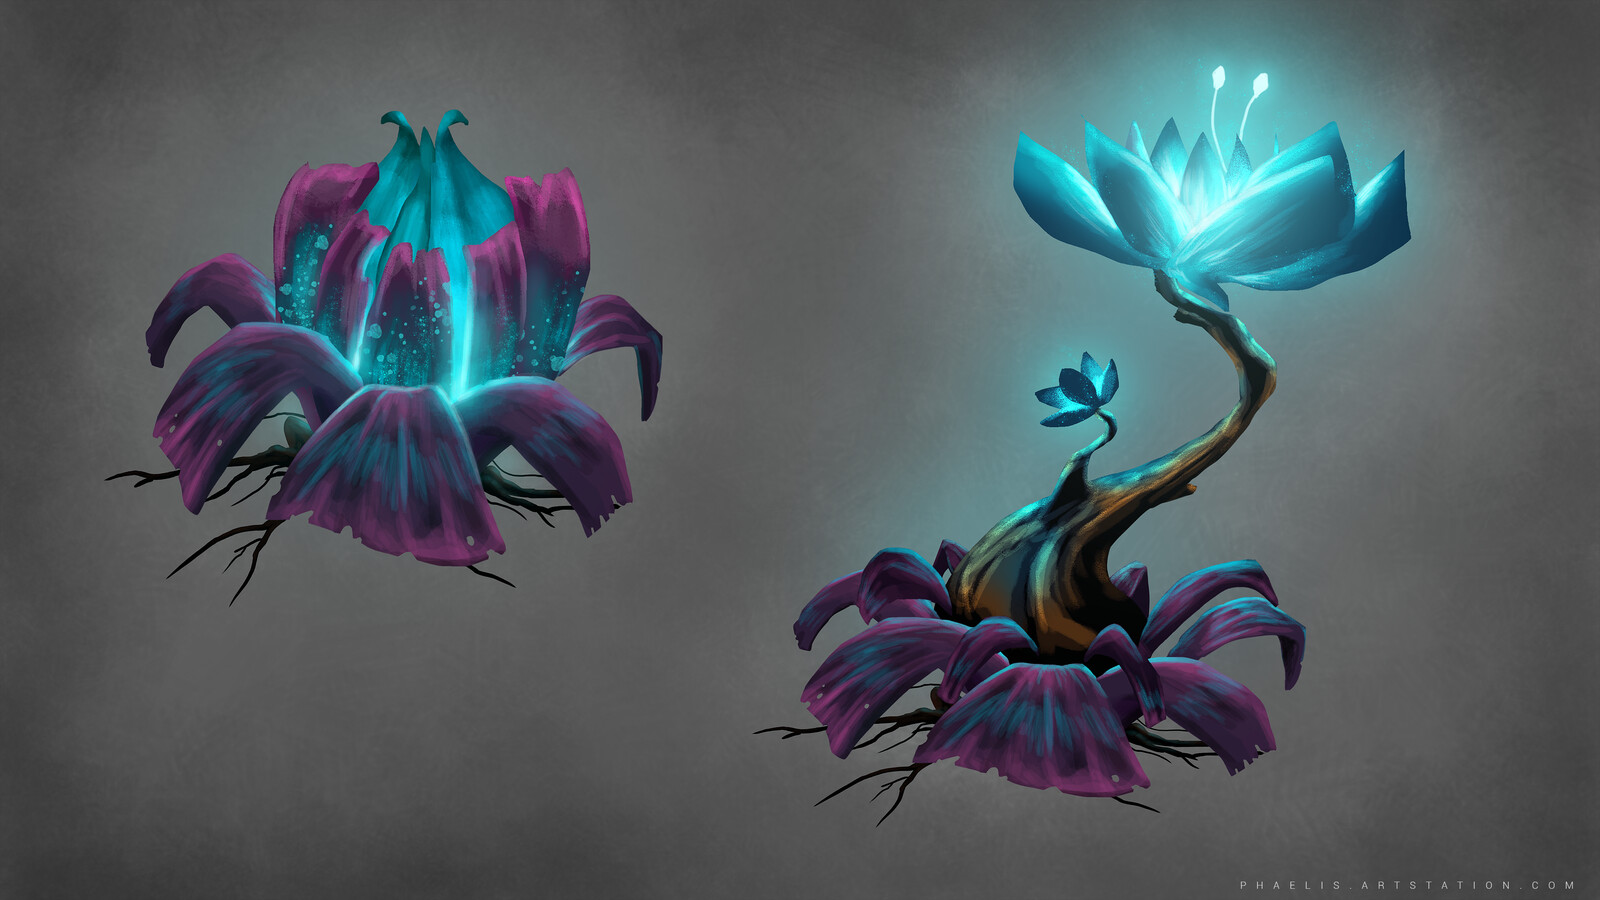 ASRA - Plants and crystals concepts